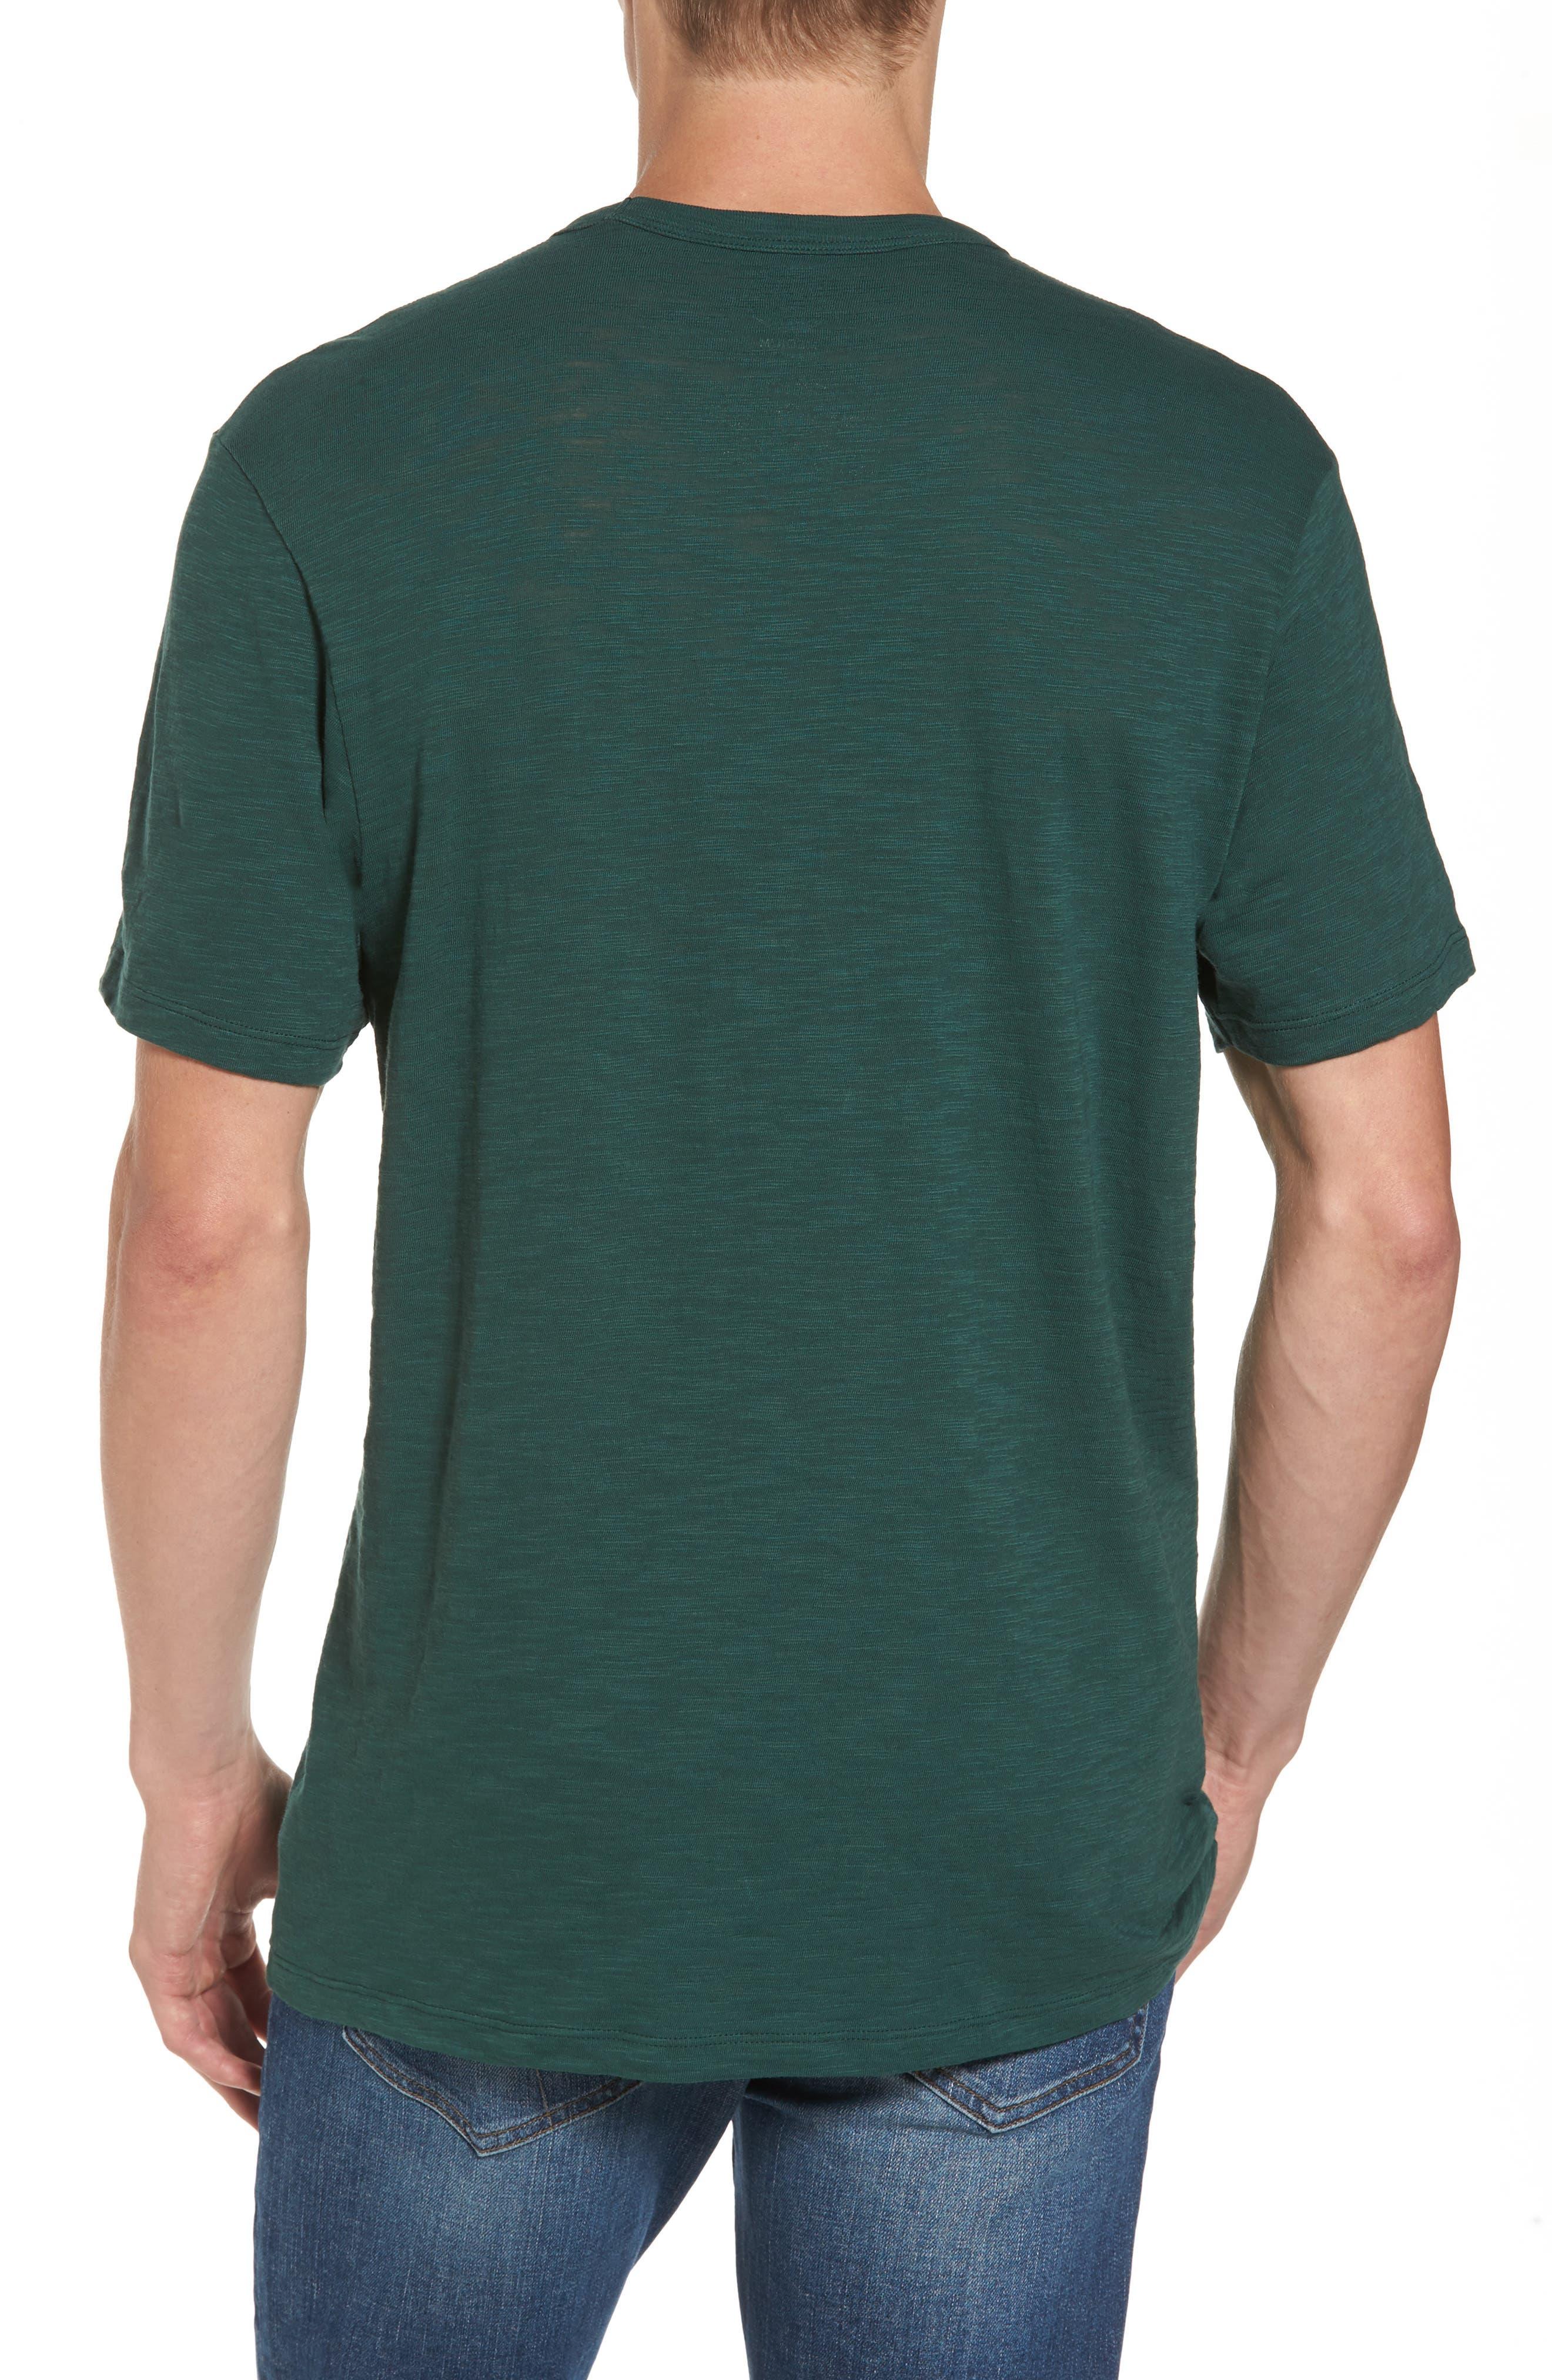 Green Bay Packers T-Shirt,                             Alternate thumbnail 2, color,                             Dark Green